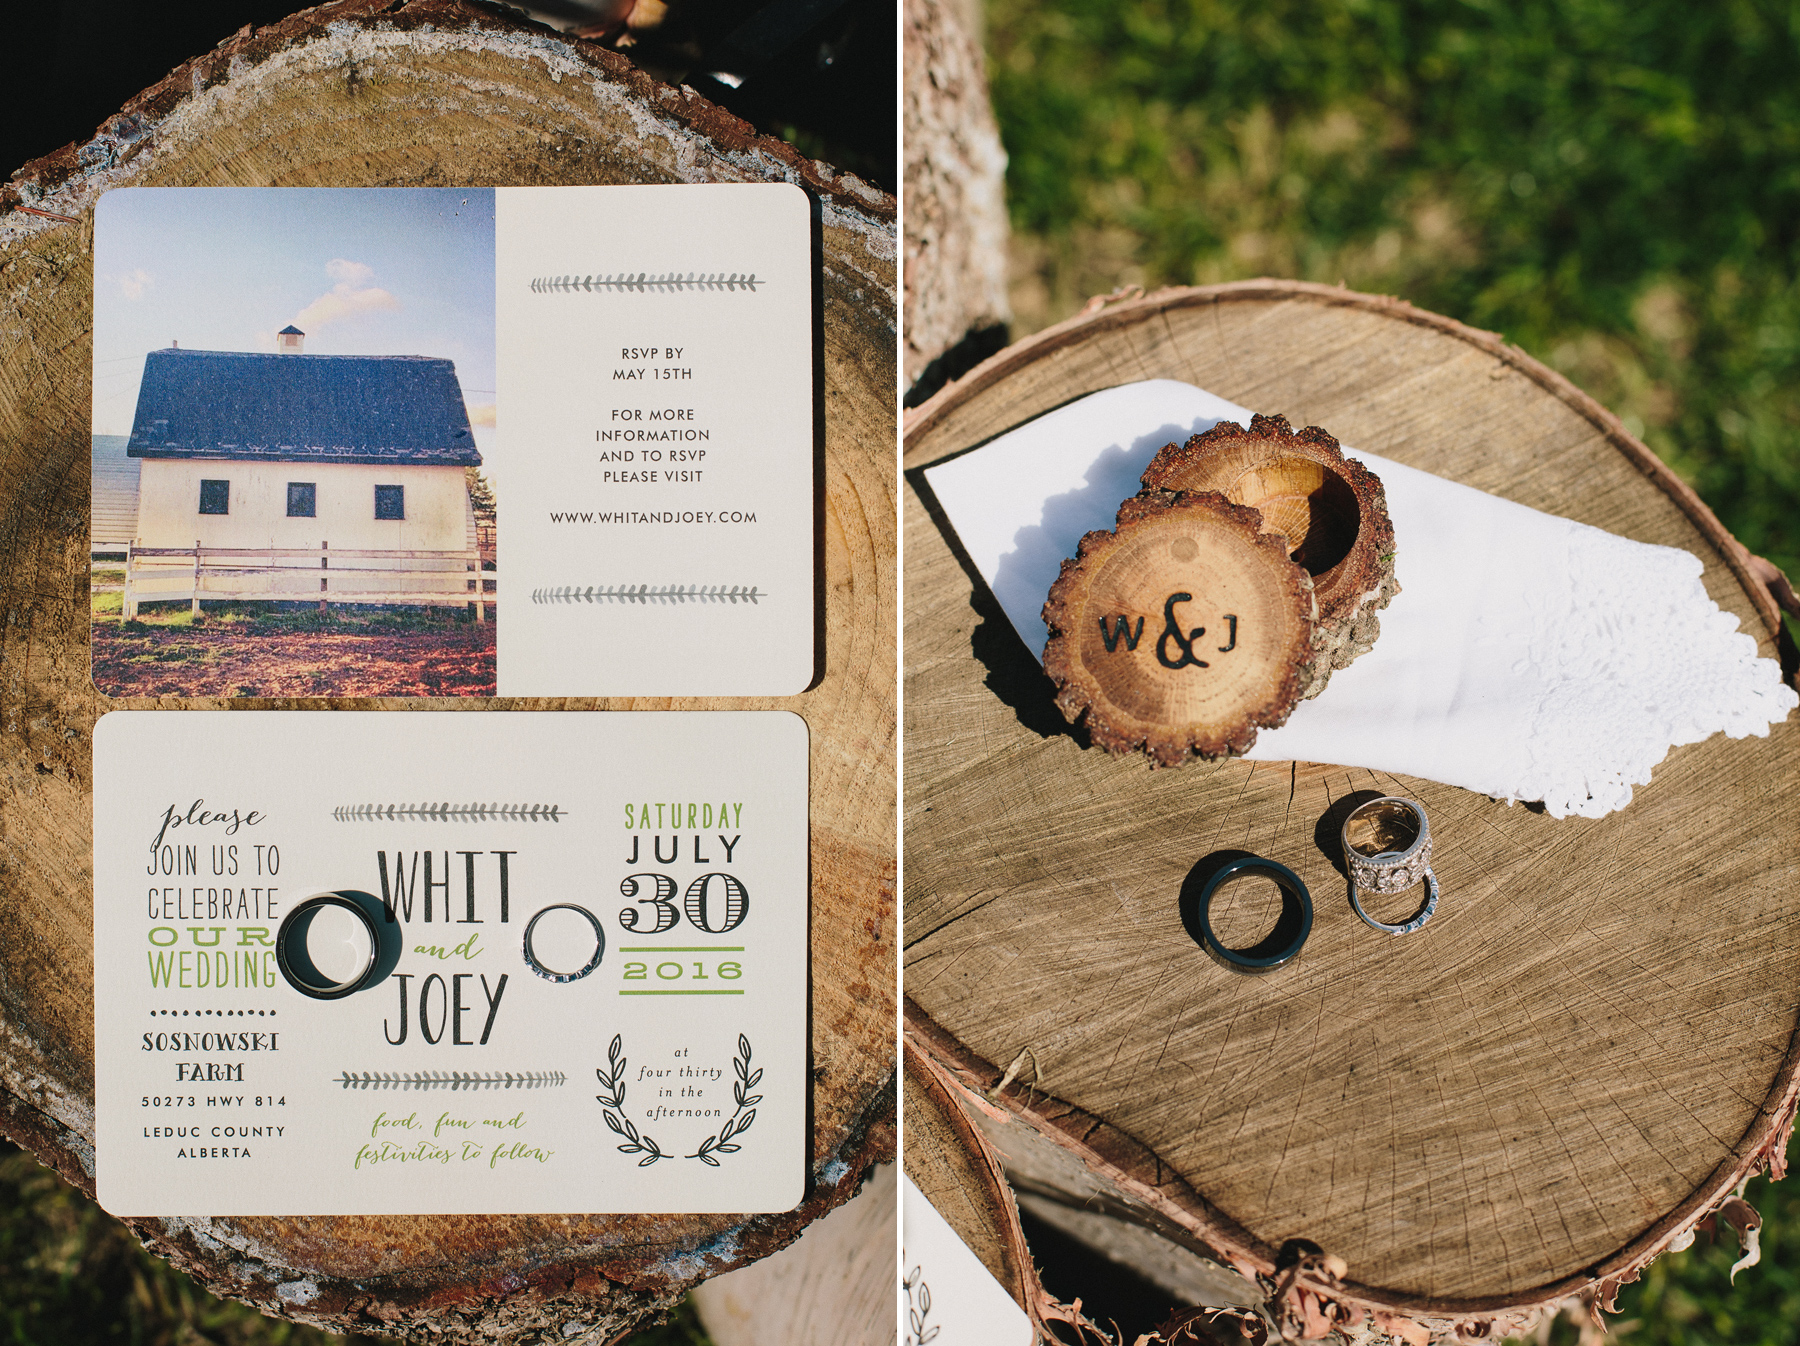 alberta-farm-wedding-photographer-rp-wj-003.jpg